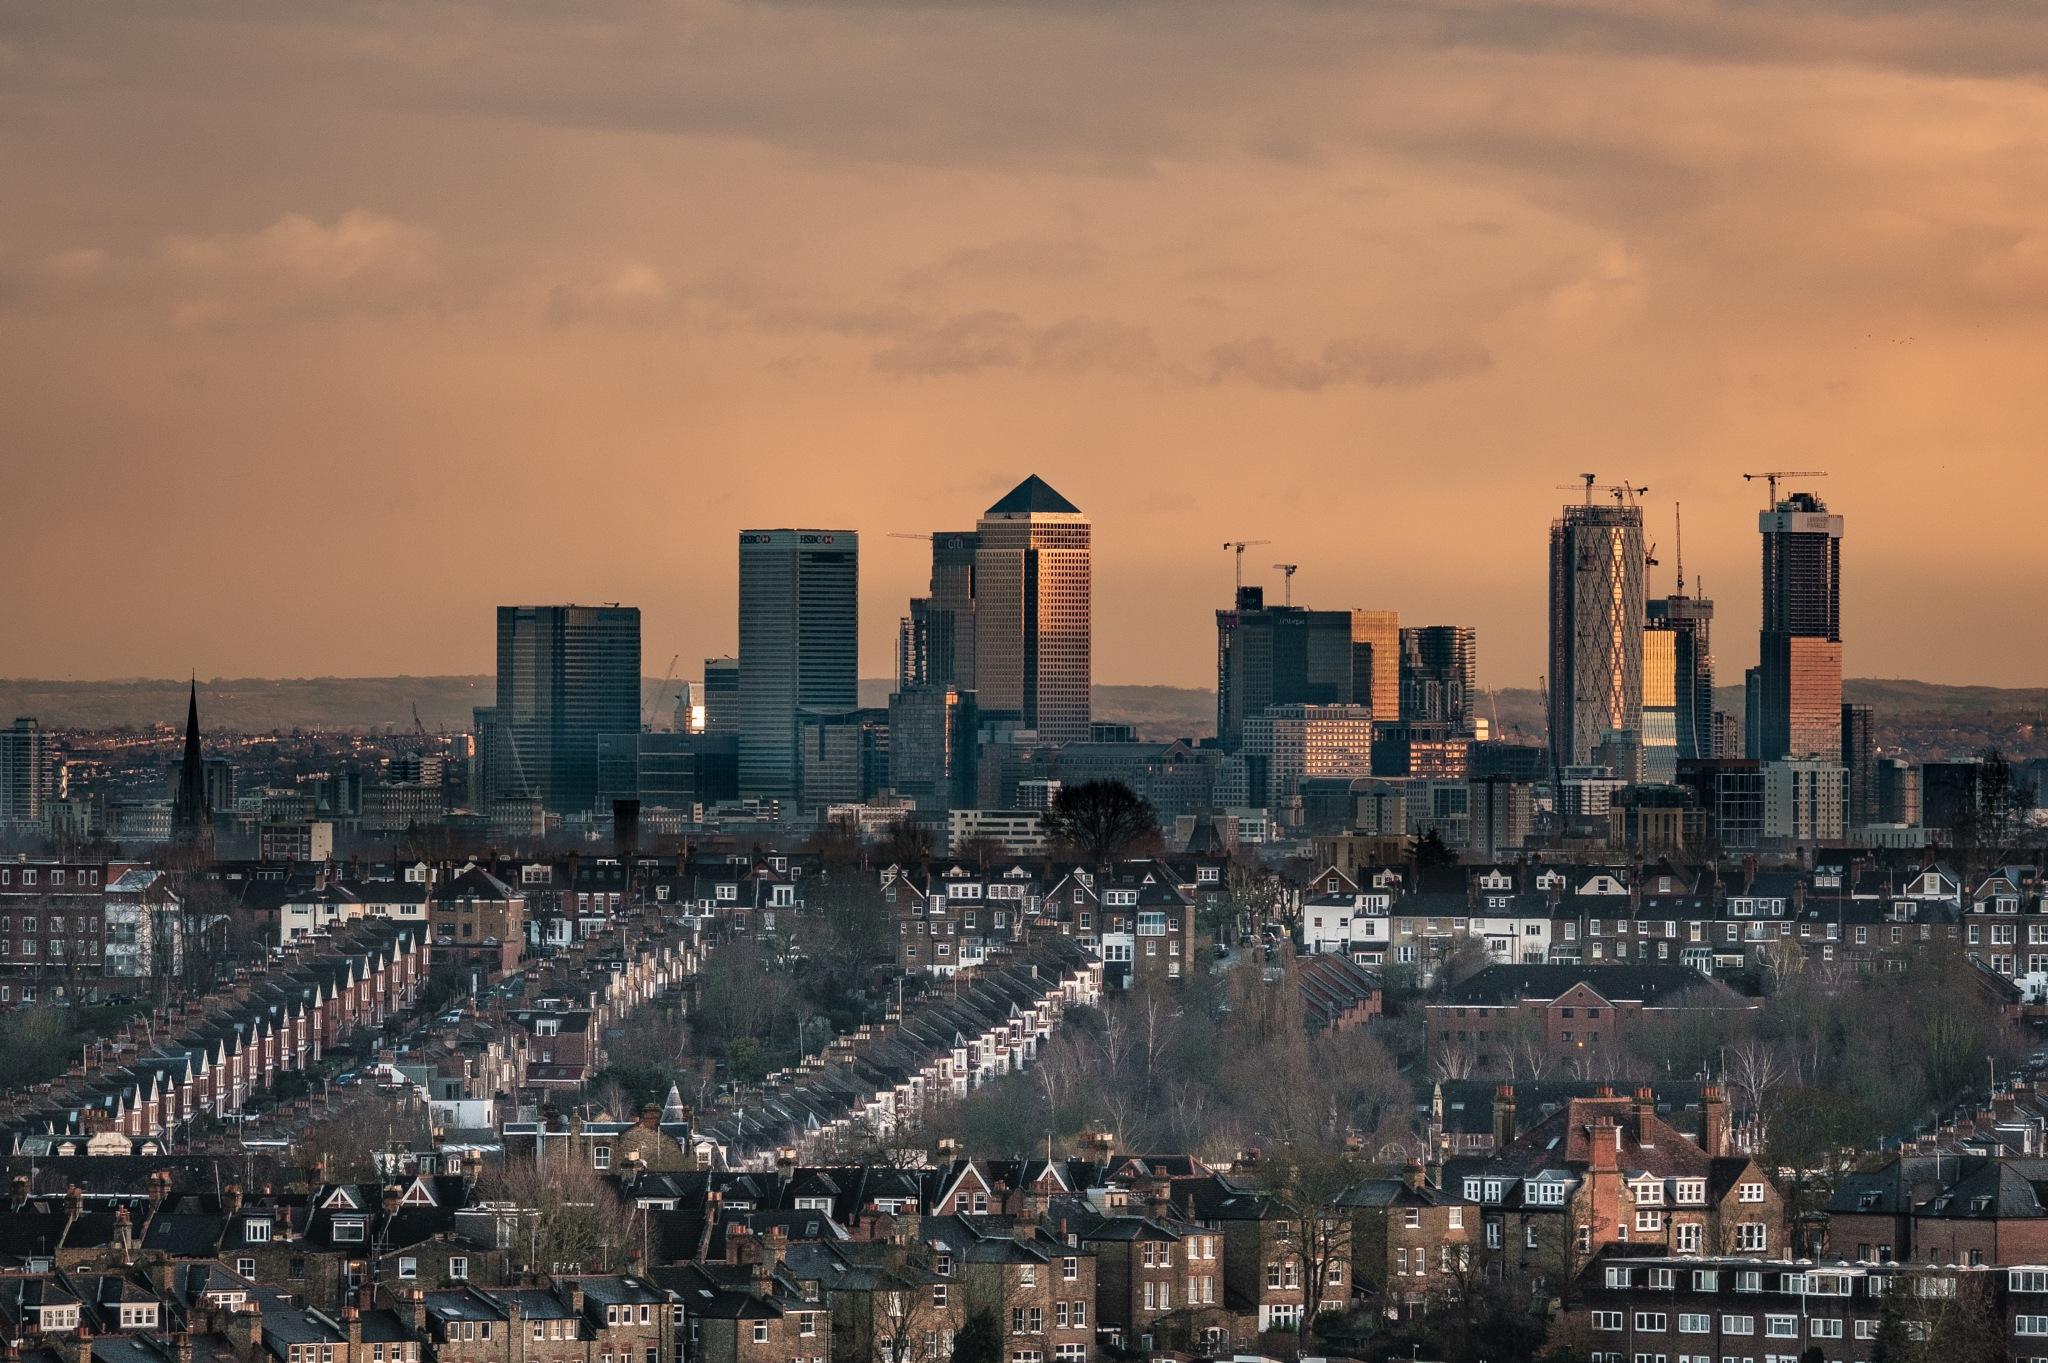 Canary Wharf, London by dionysis morfis